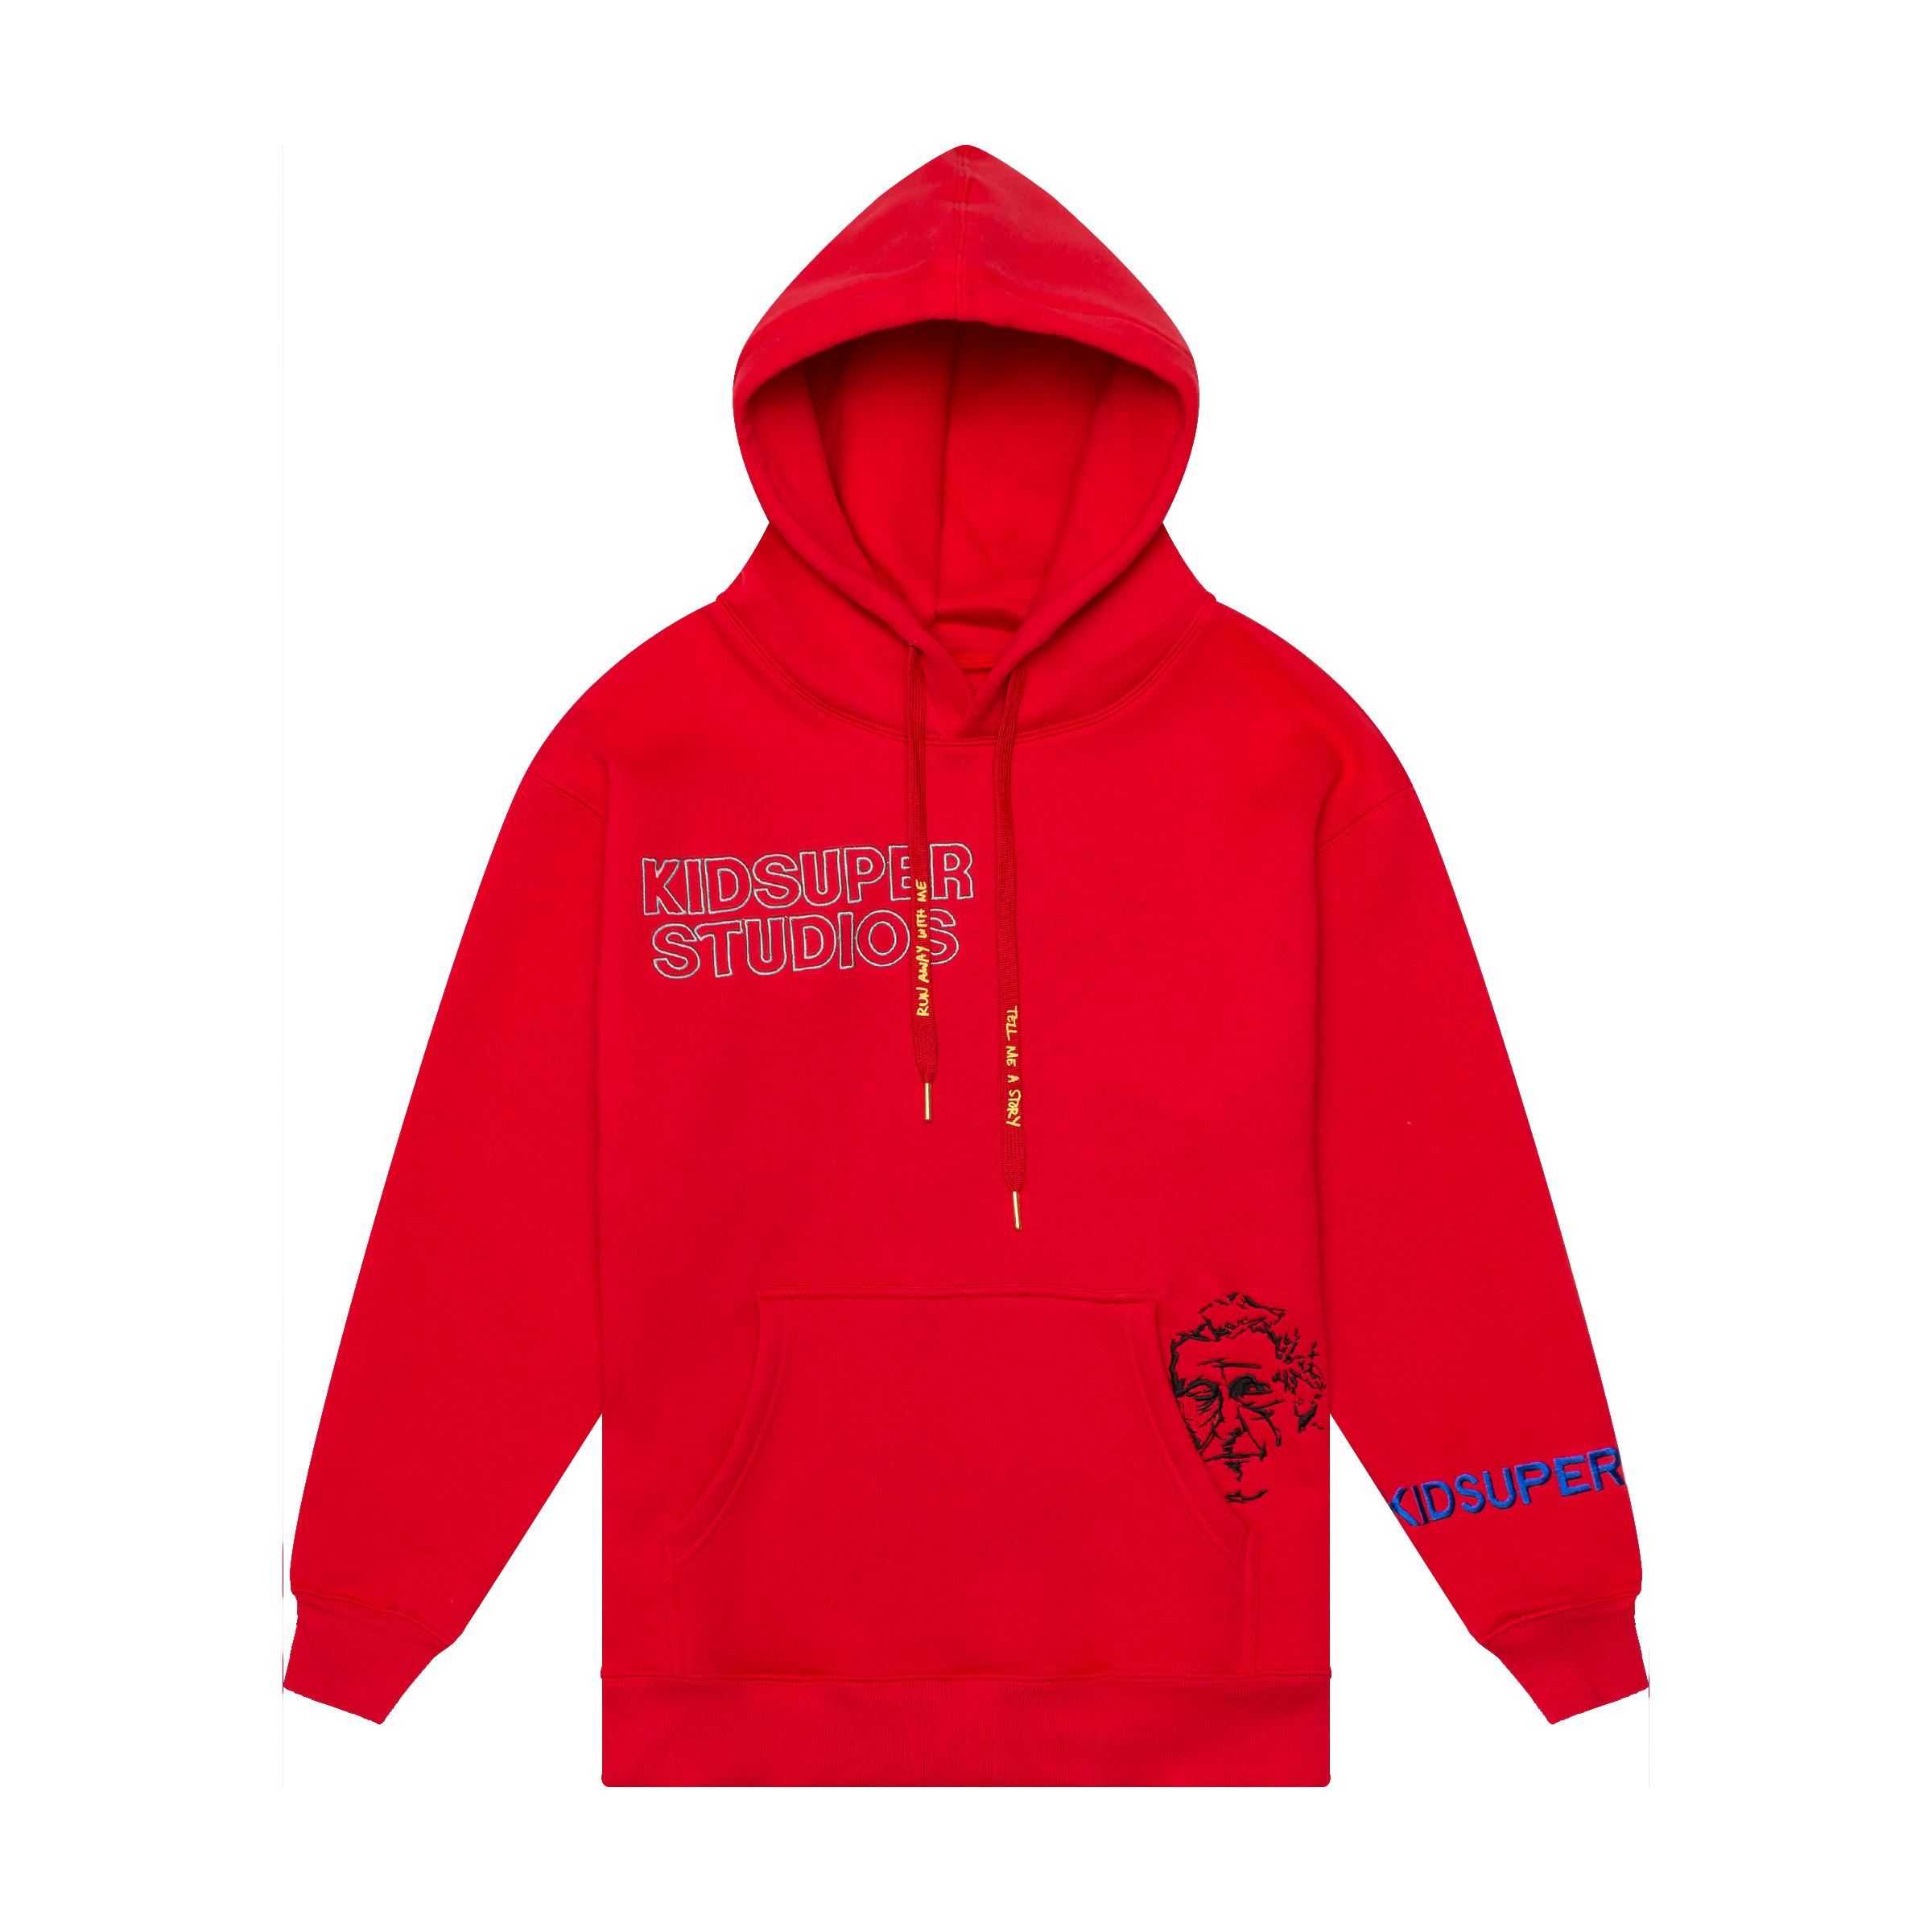 hoodie product photo